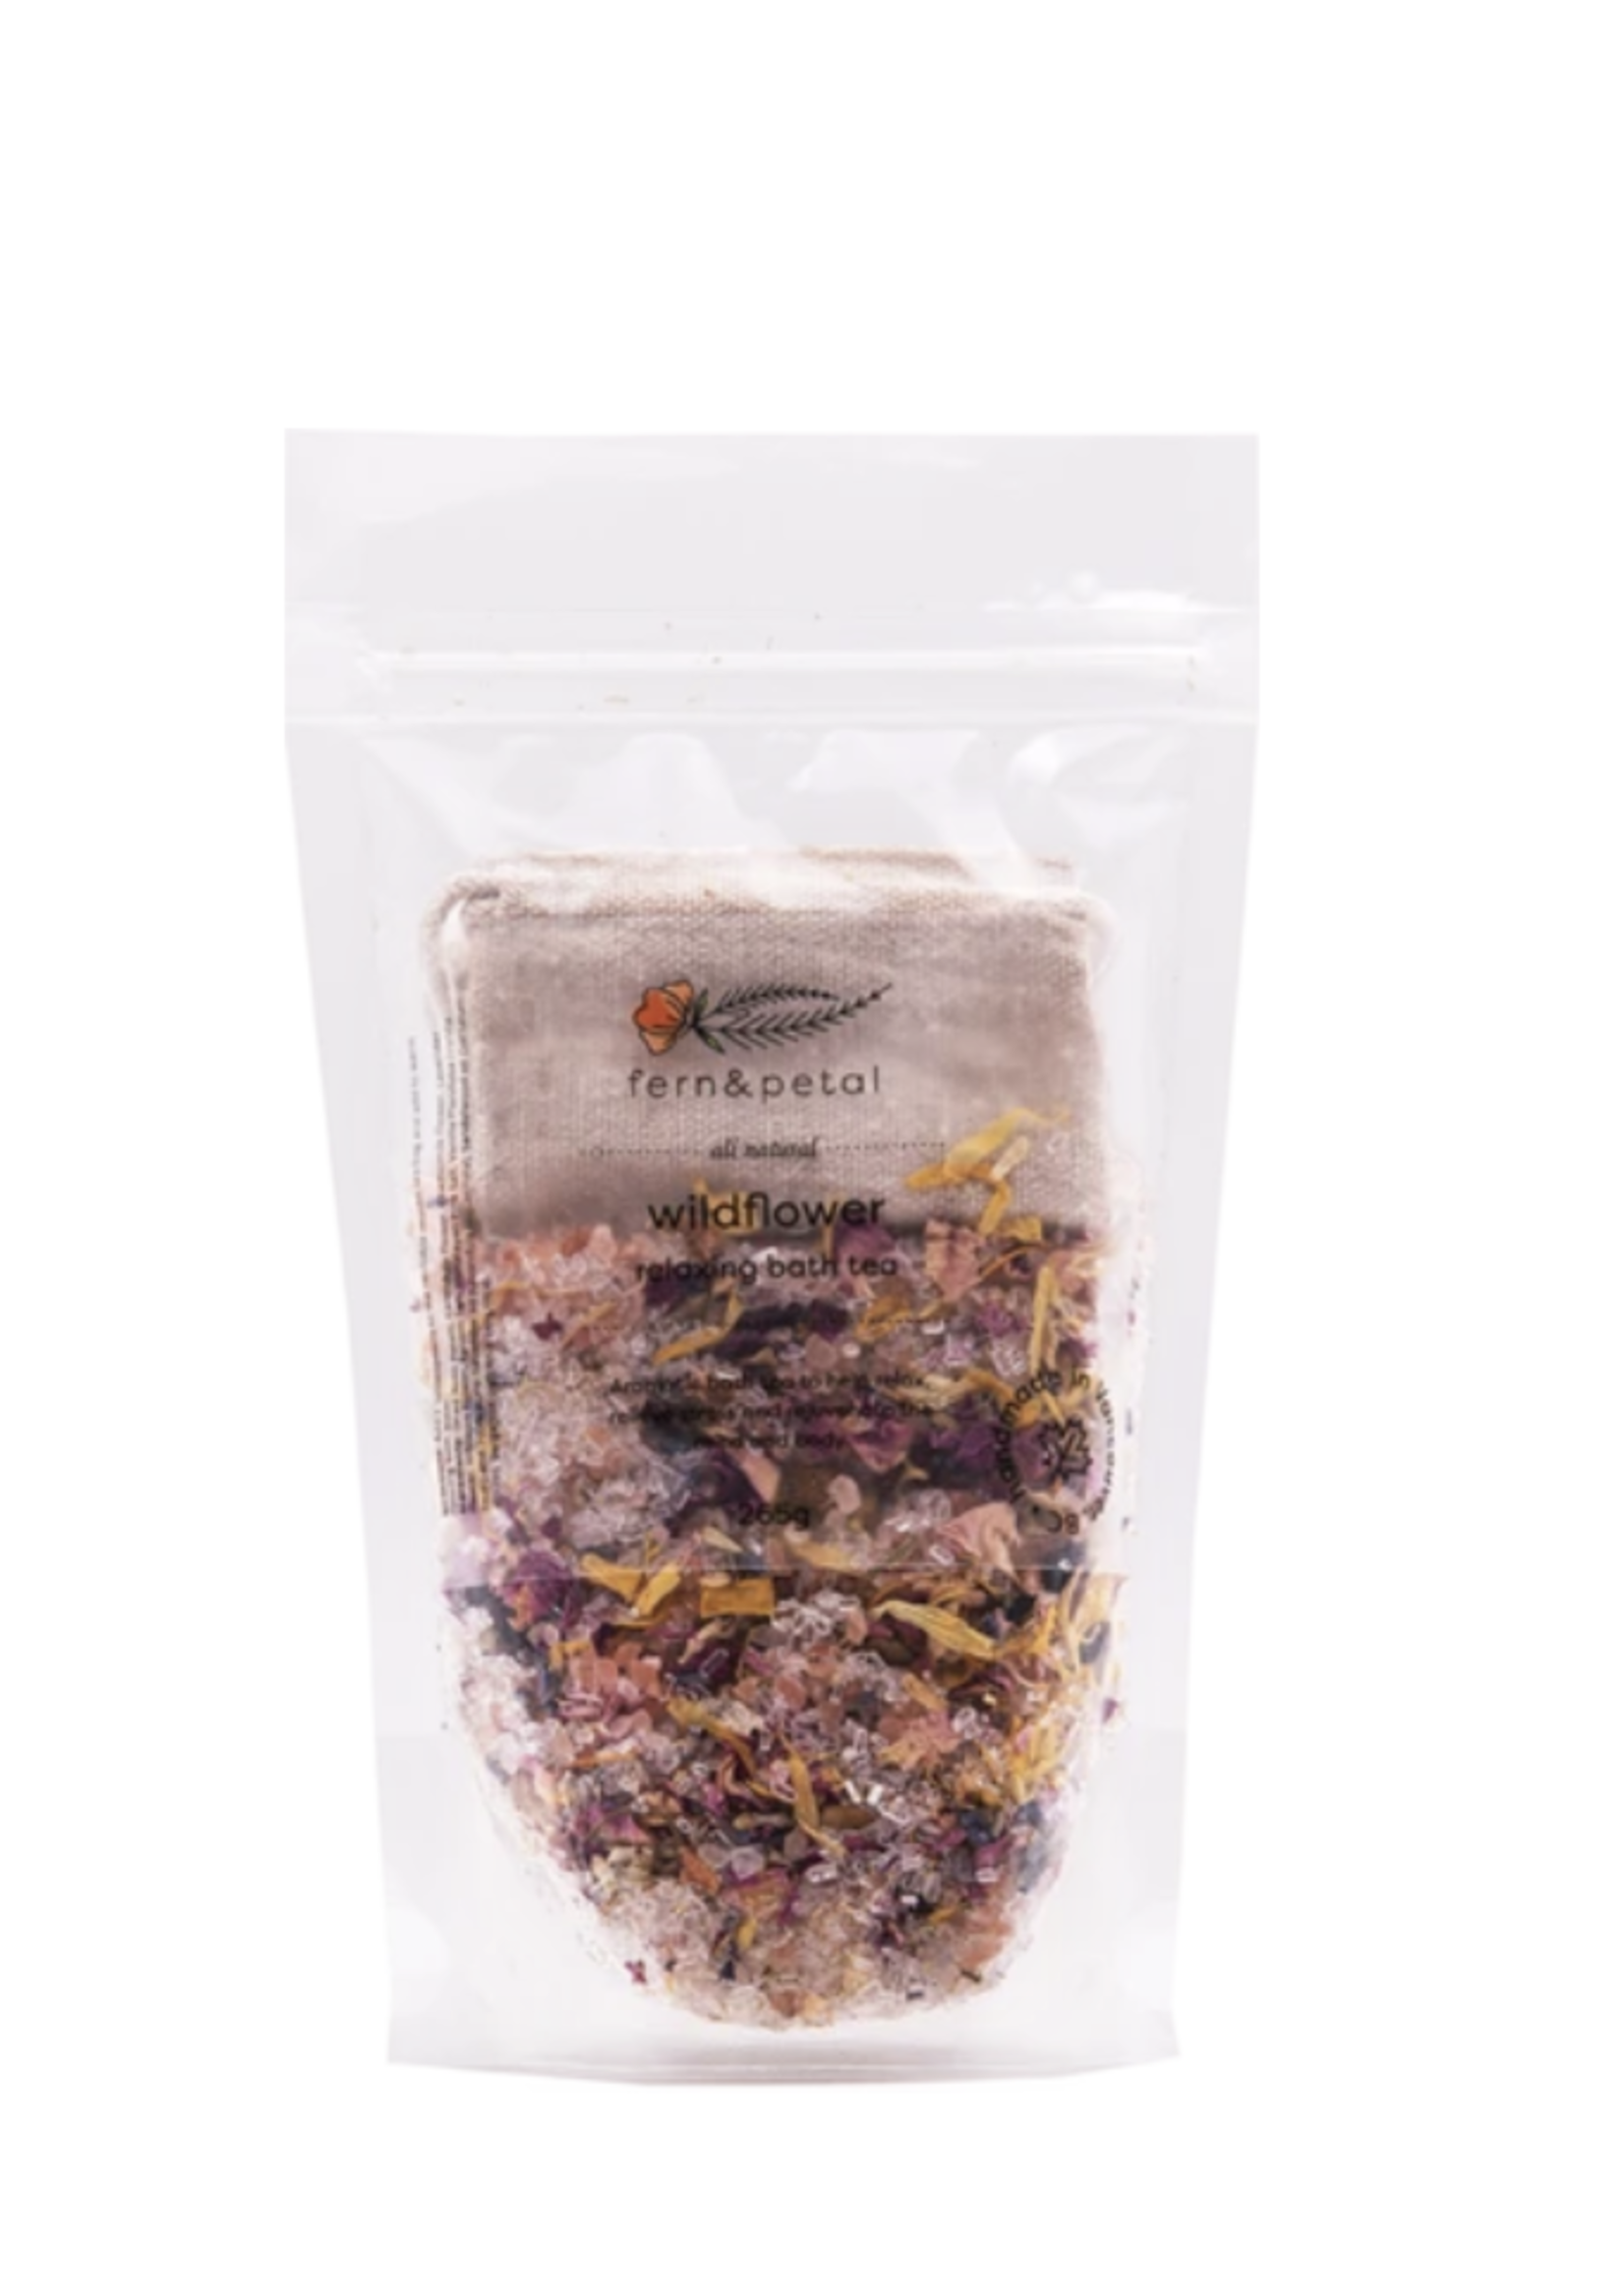 Wildflower Bath Tea   265g